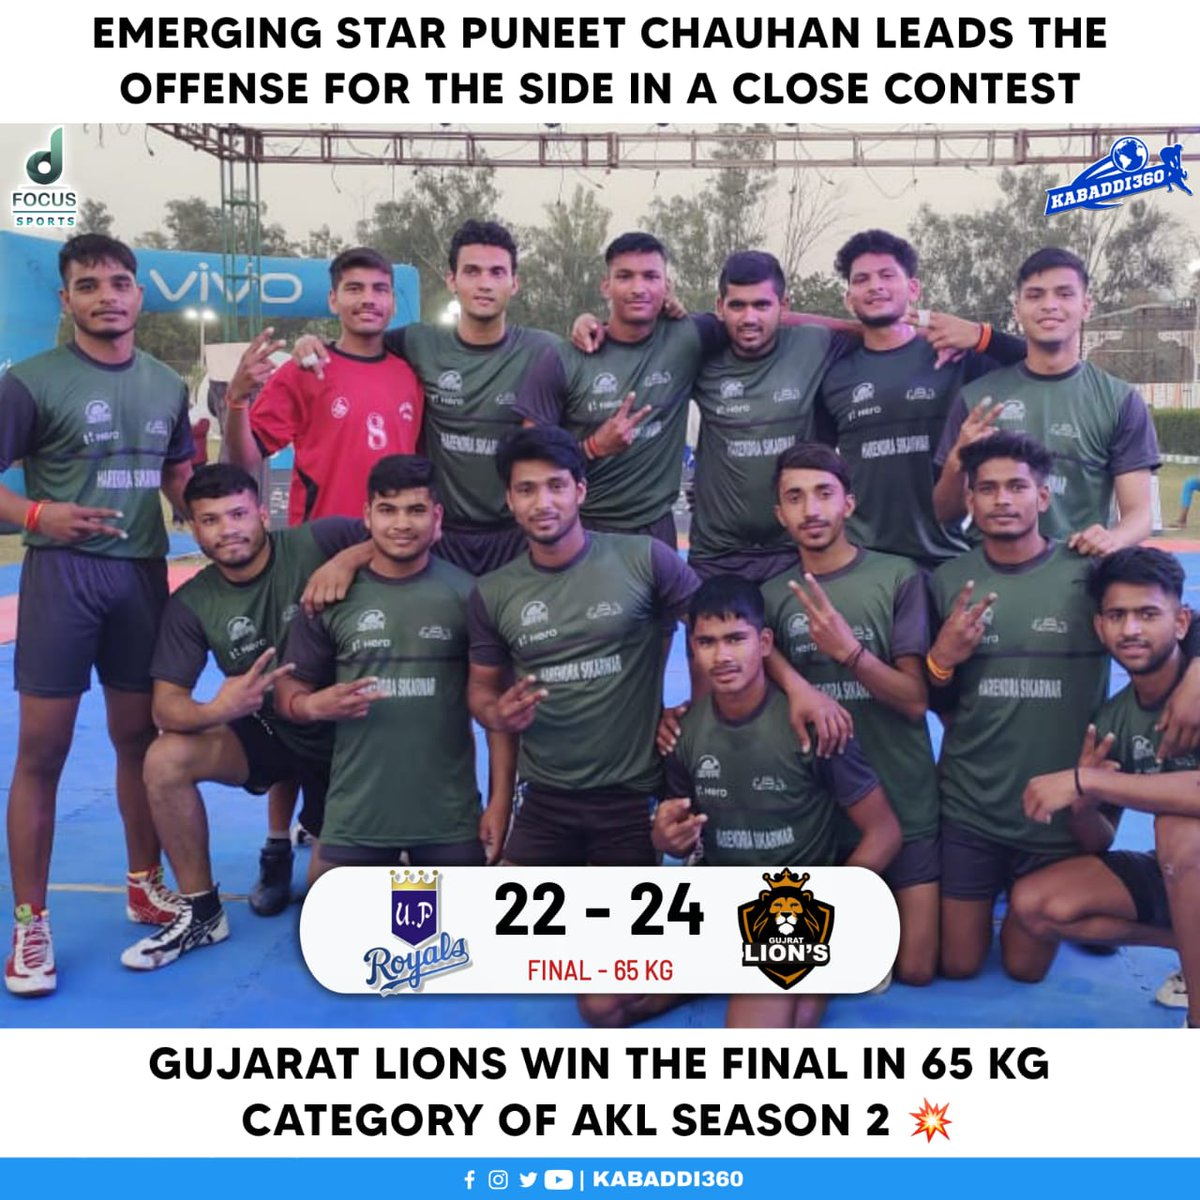 Congratulations to the winning team of 65 kg category - Gujarat Lions 🎉  #AgraKabaddiLeague #KabaddiResults #Kabaddi360